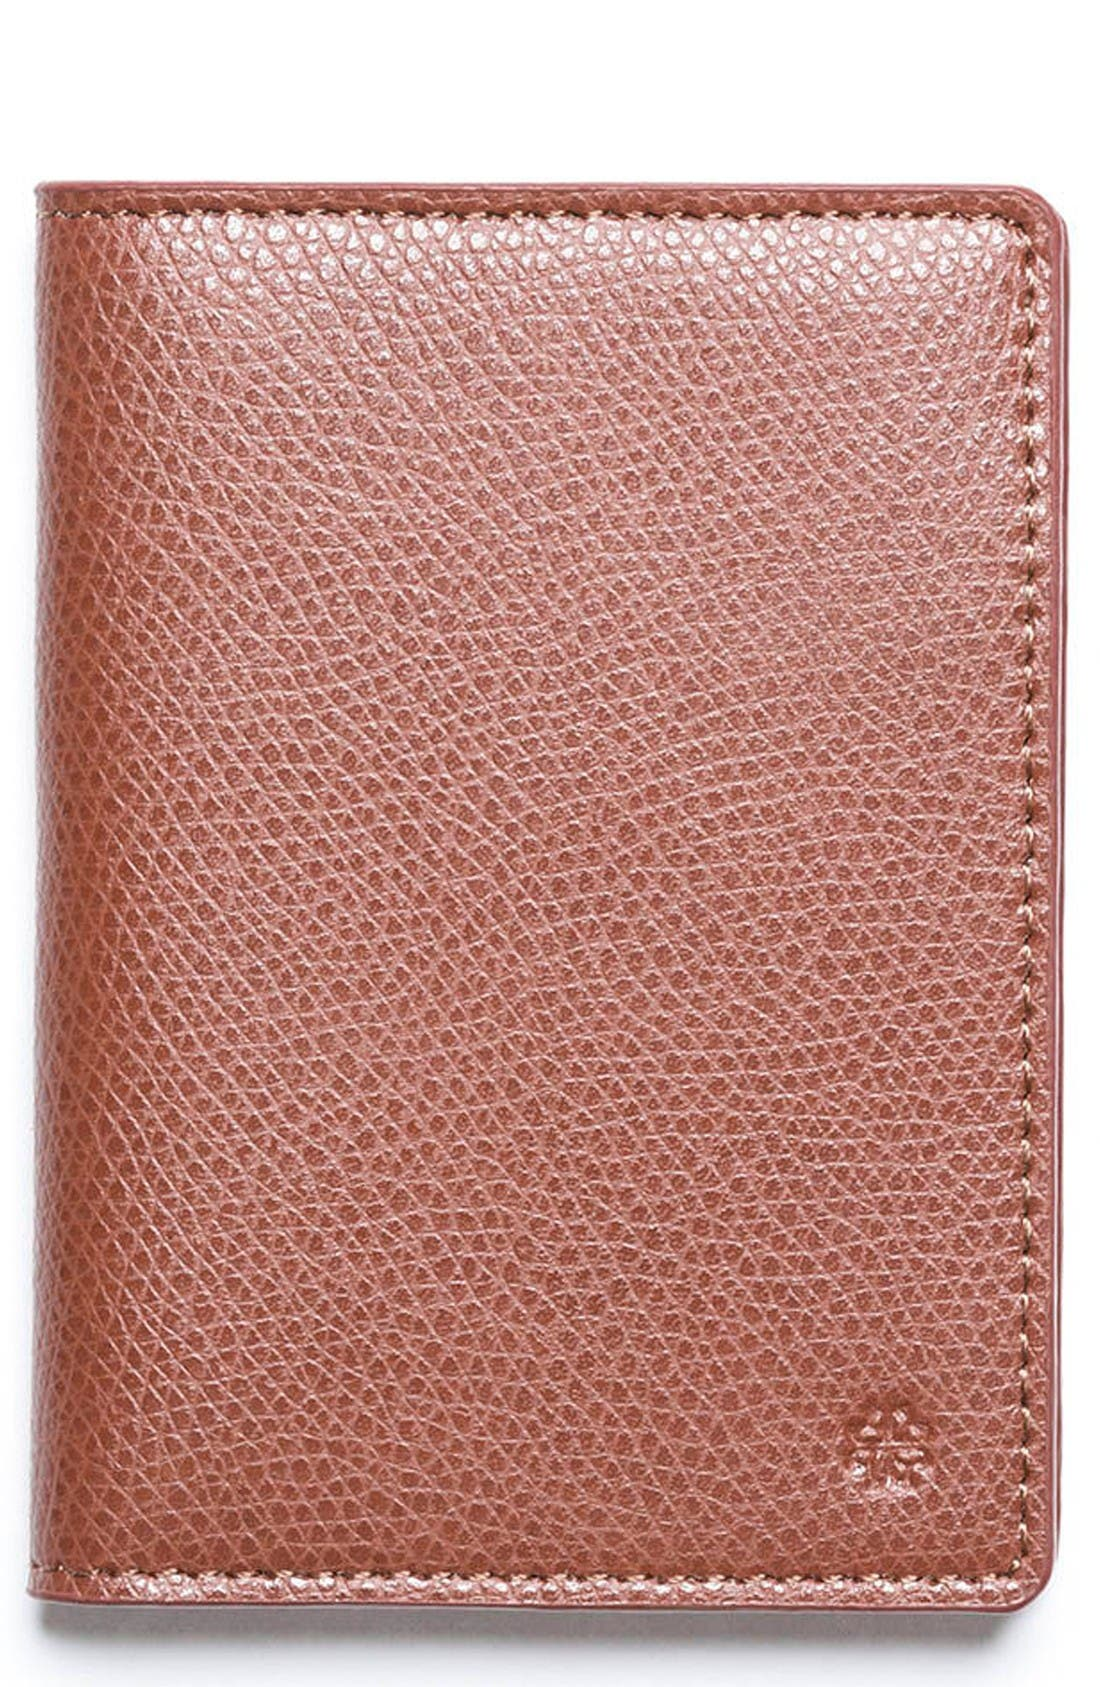 hook + ALBERT Vertical Leather Wallet